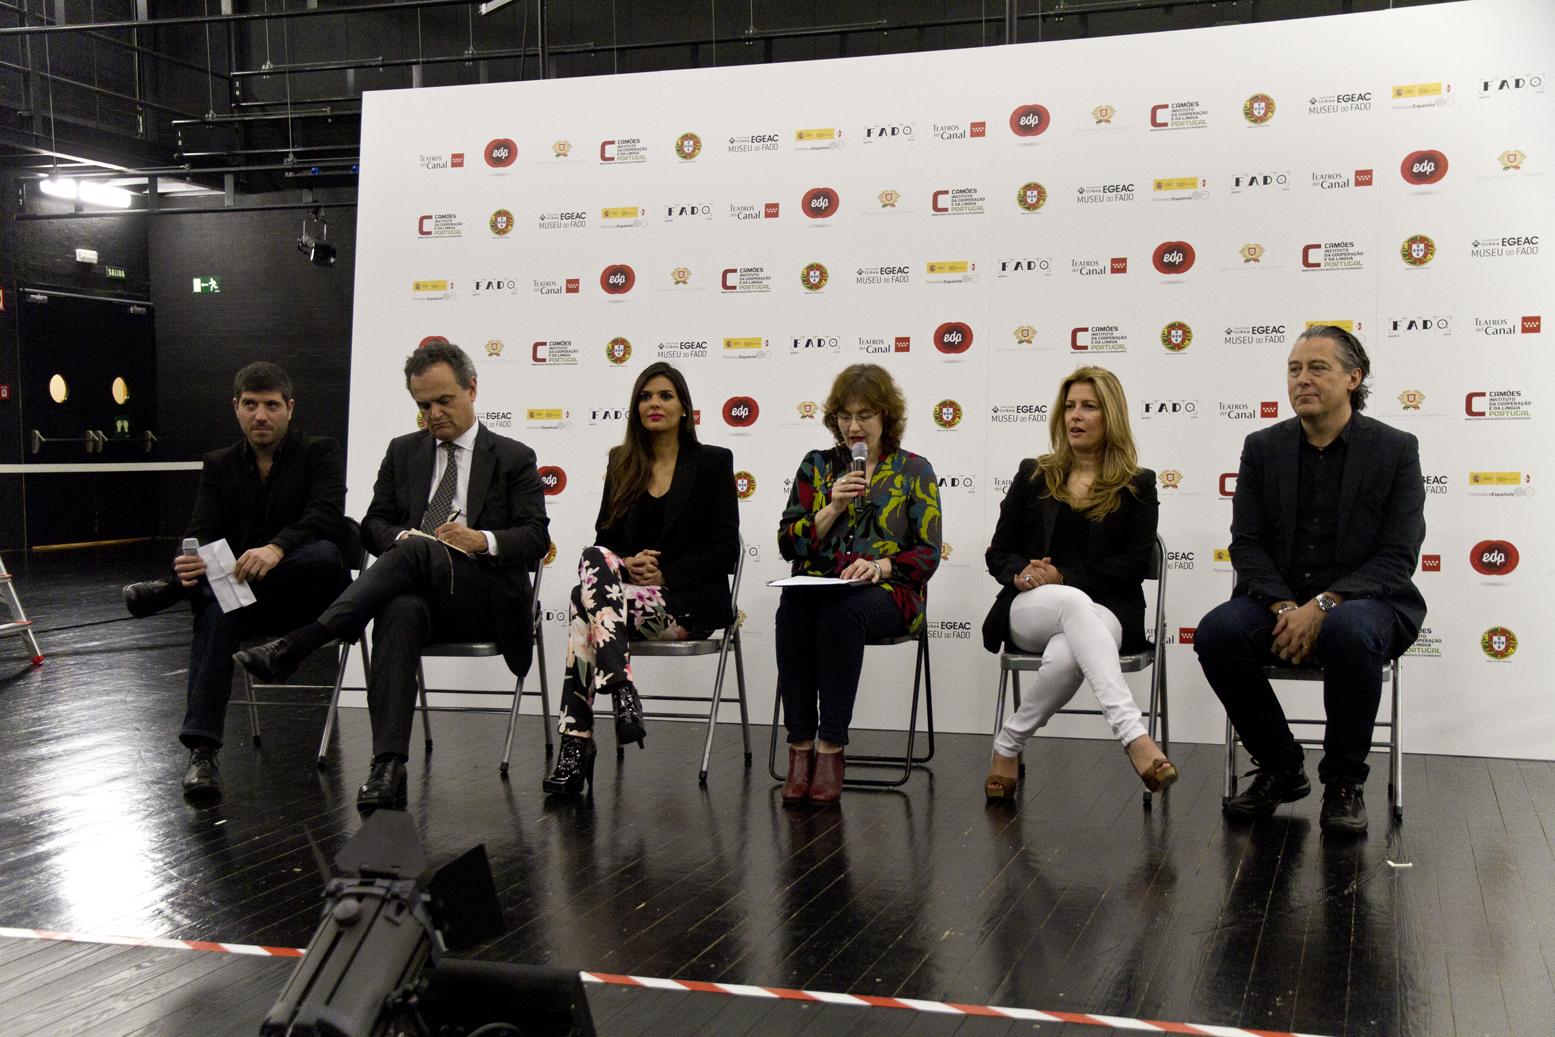 Festival de fado de Madrid 2016, rueda de prensa